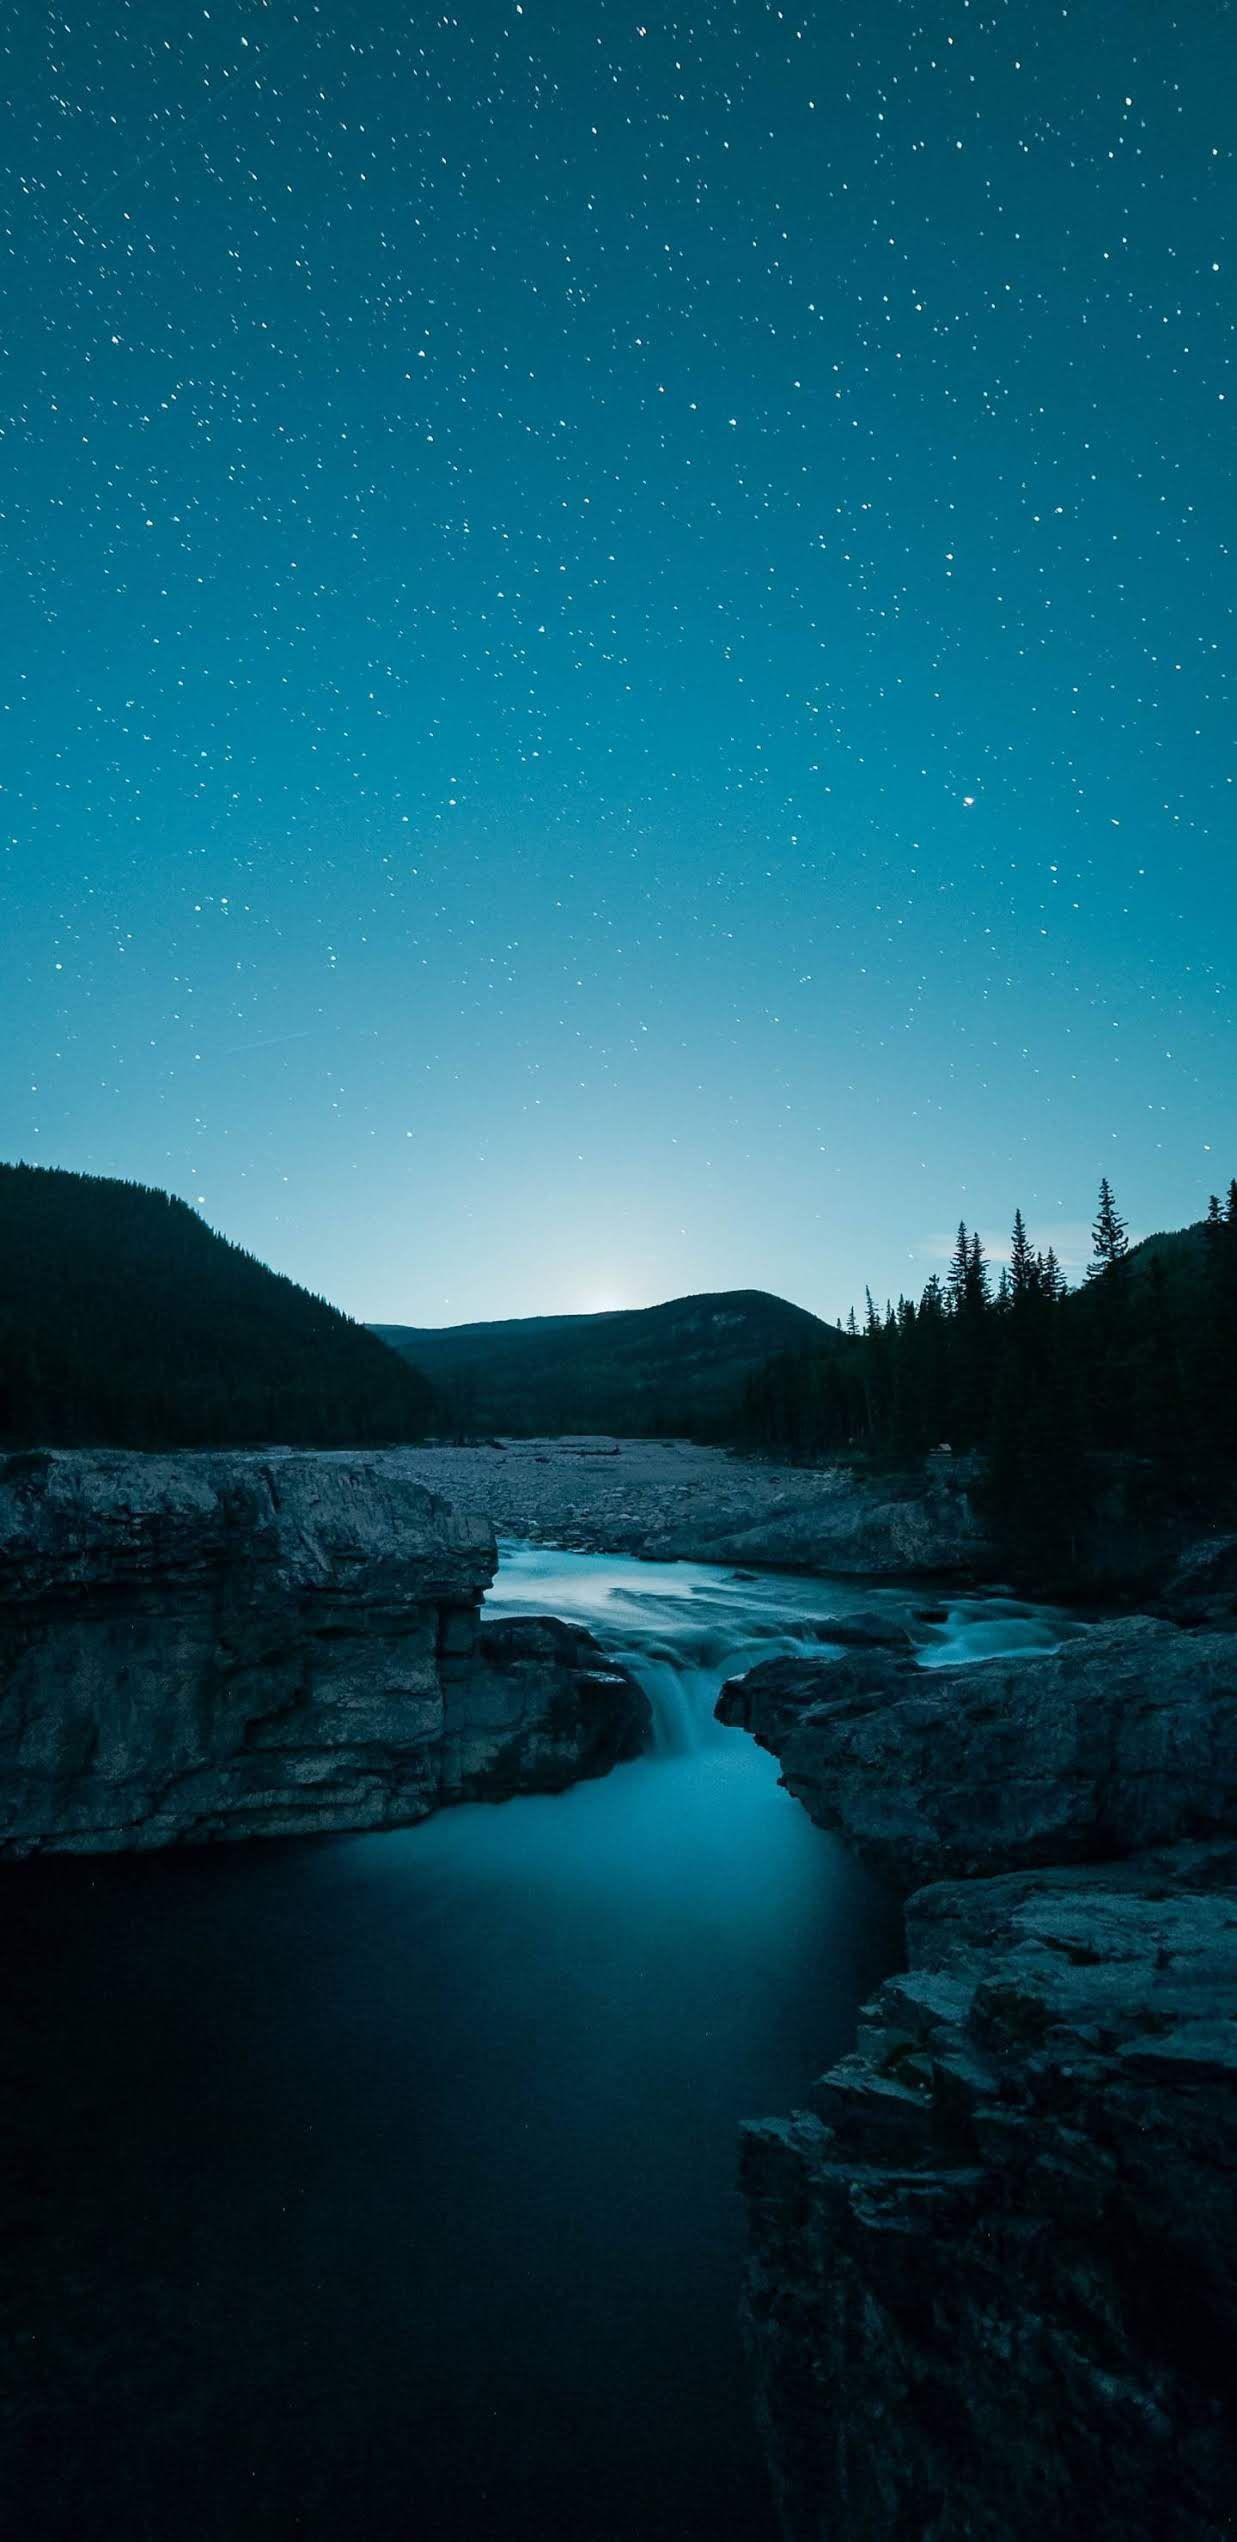 Night Sky Mobile Wallpaper In 2020 Nature Wallpaper Background Night Skies